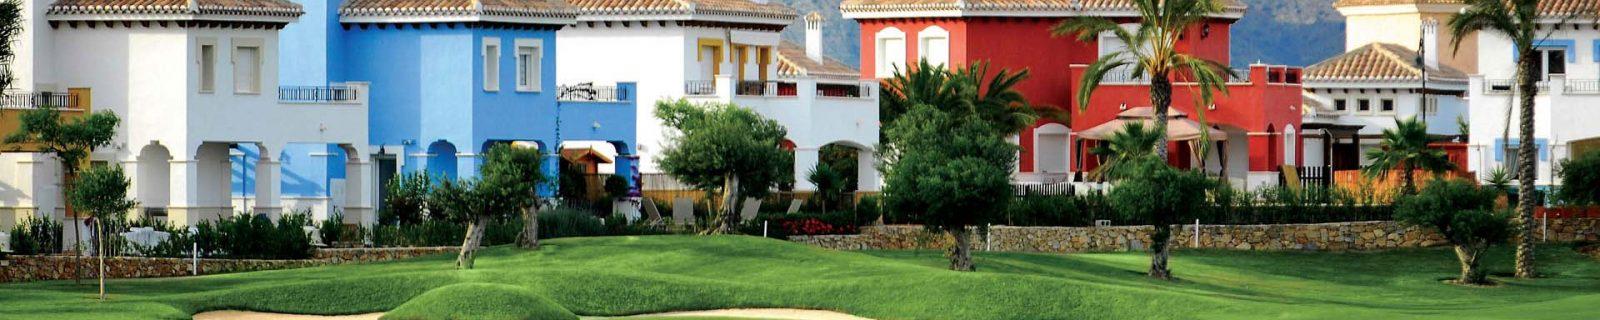 About Alhambra Villas - Estate Agents in Murcia, Spain - Alhambra Villas - Houses for Sale in Spain